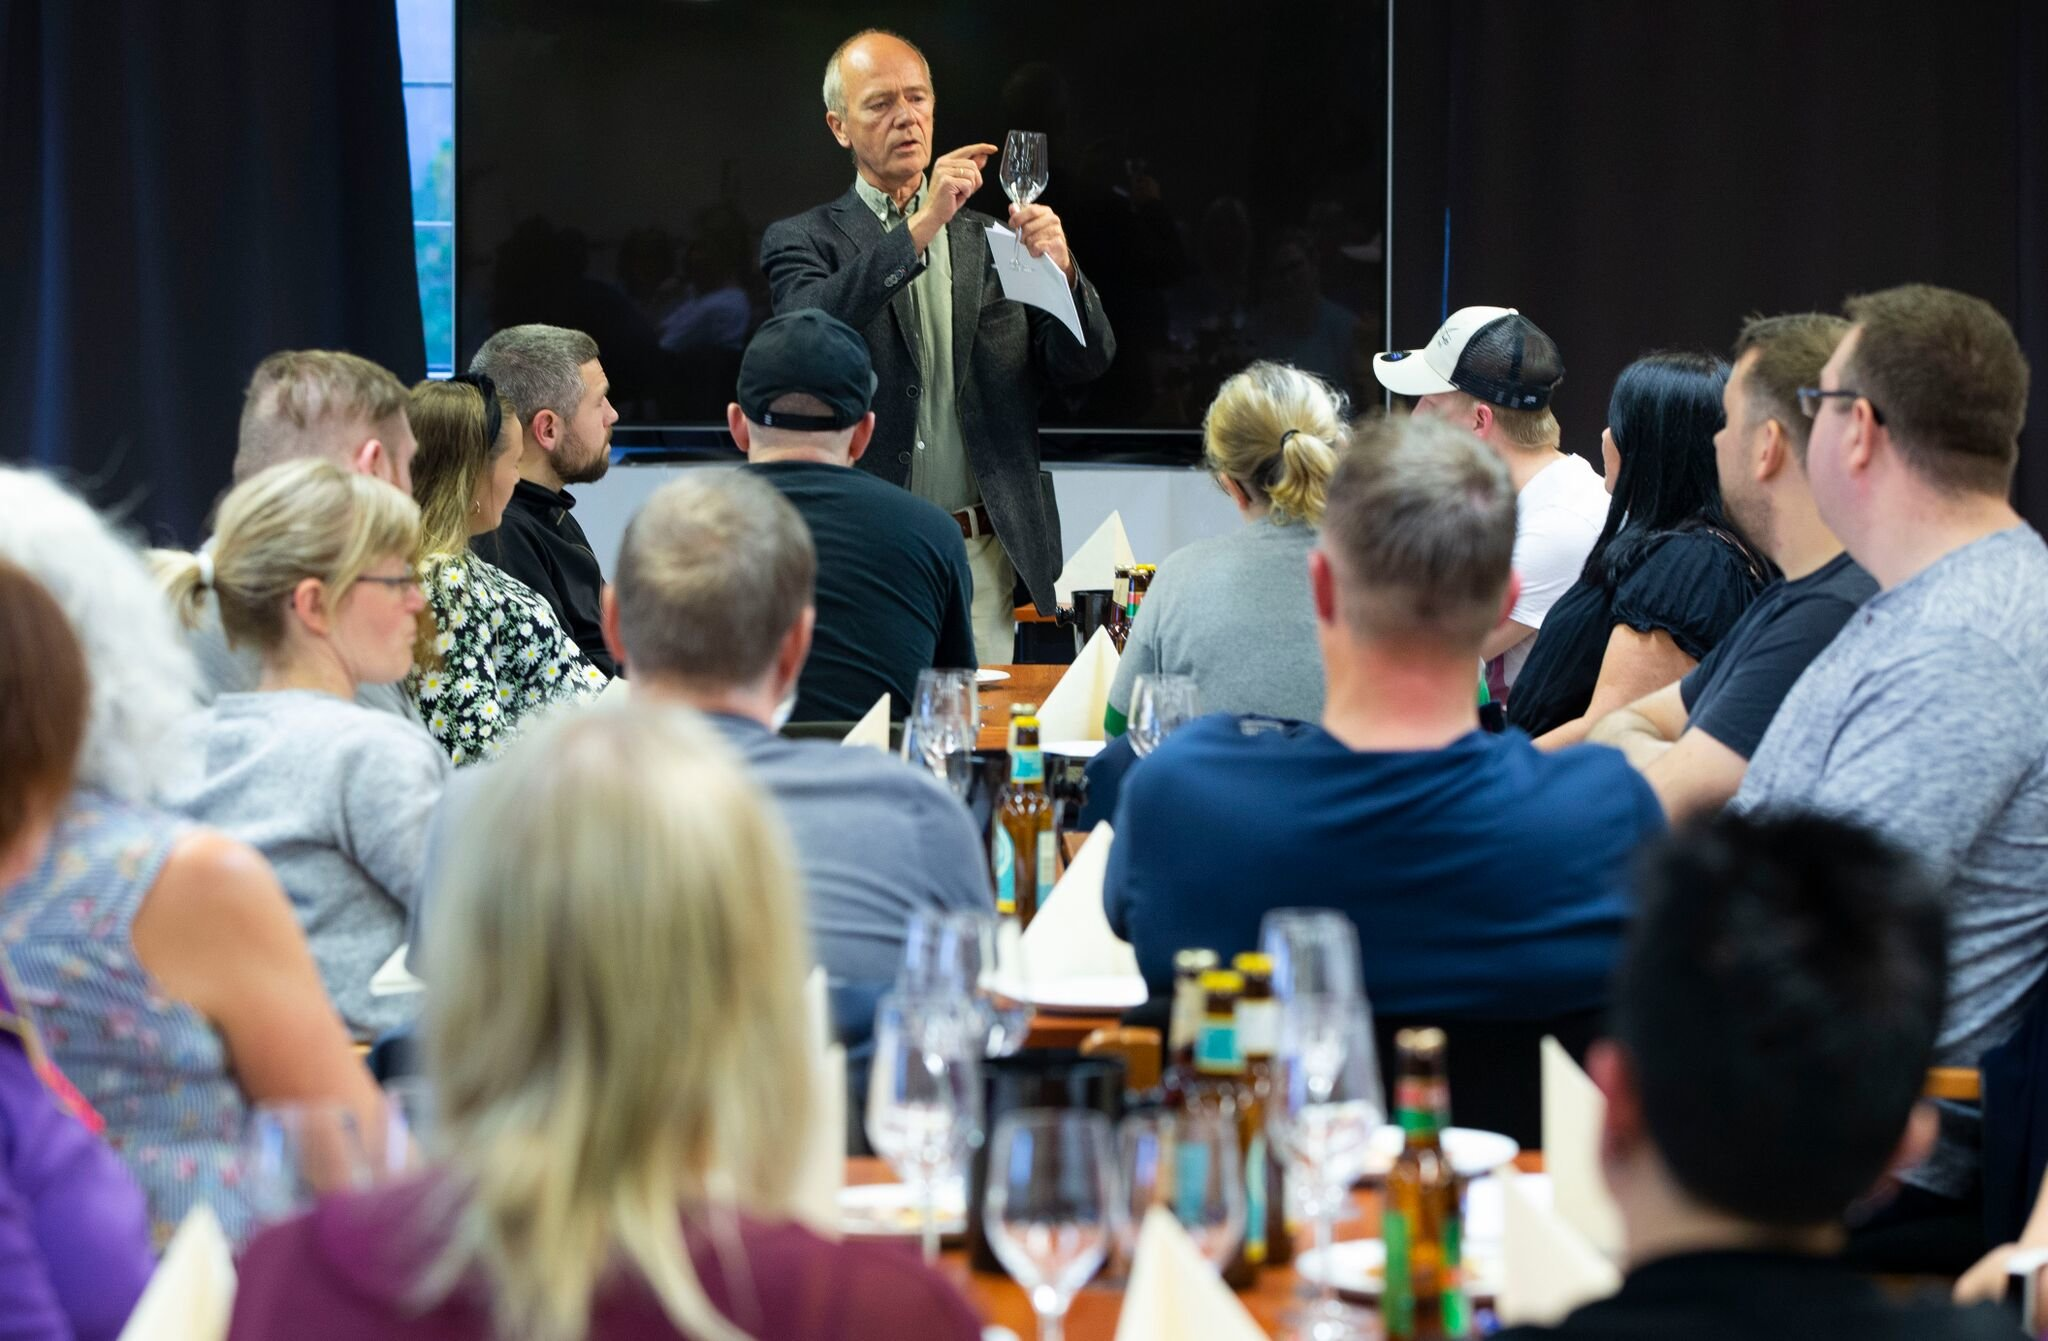 Foredragsholder ølsmaking